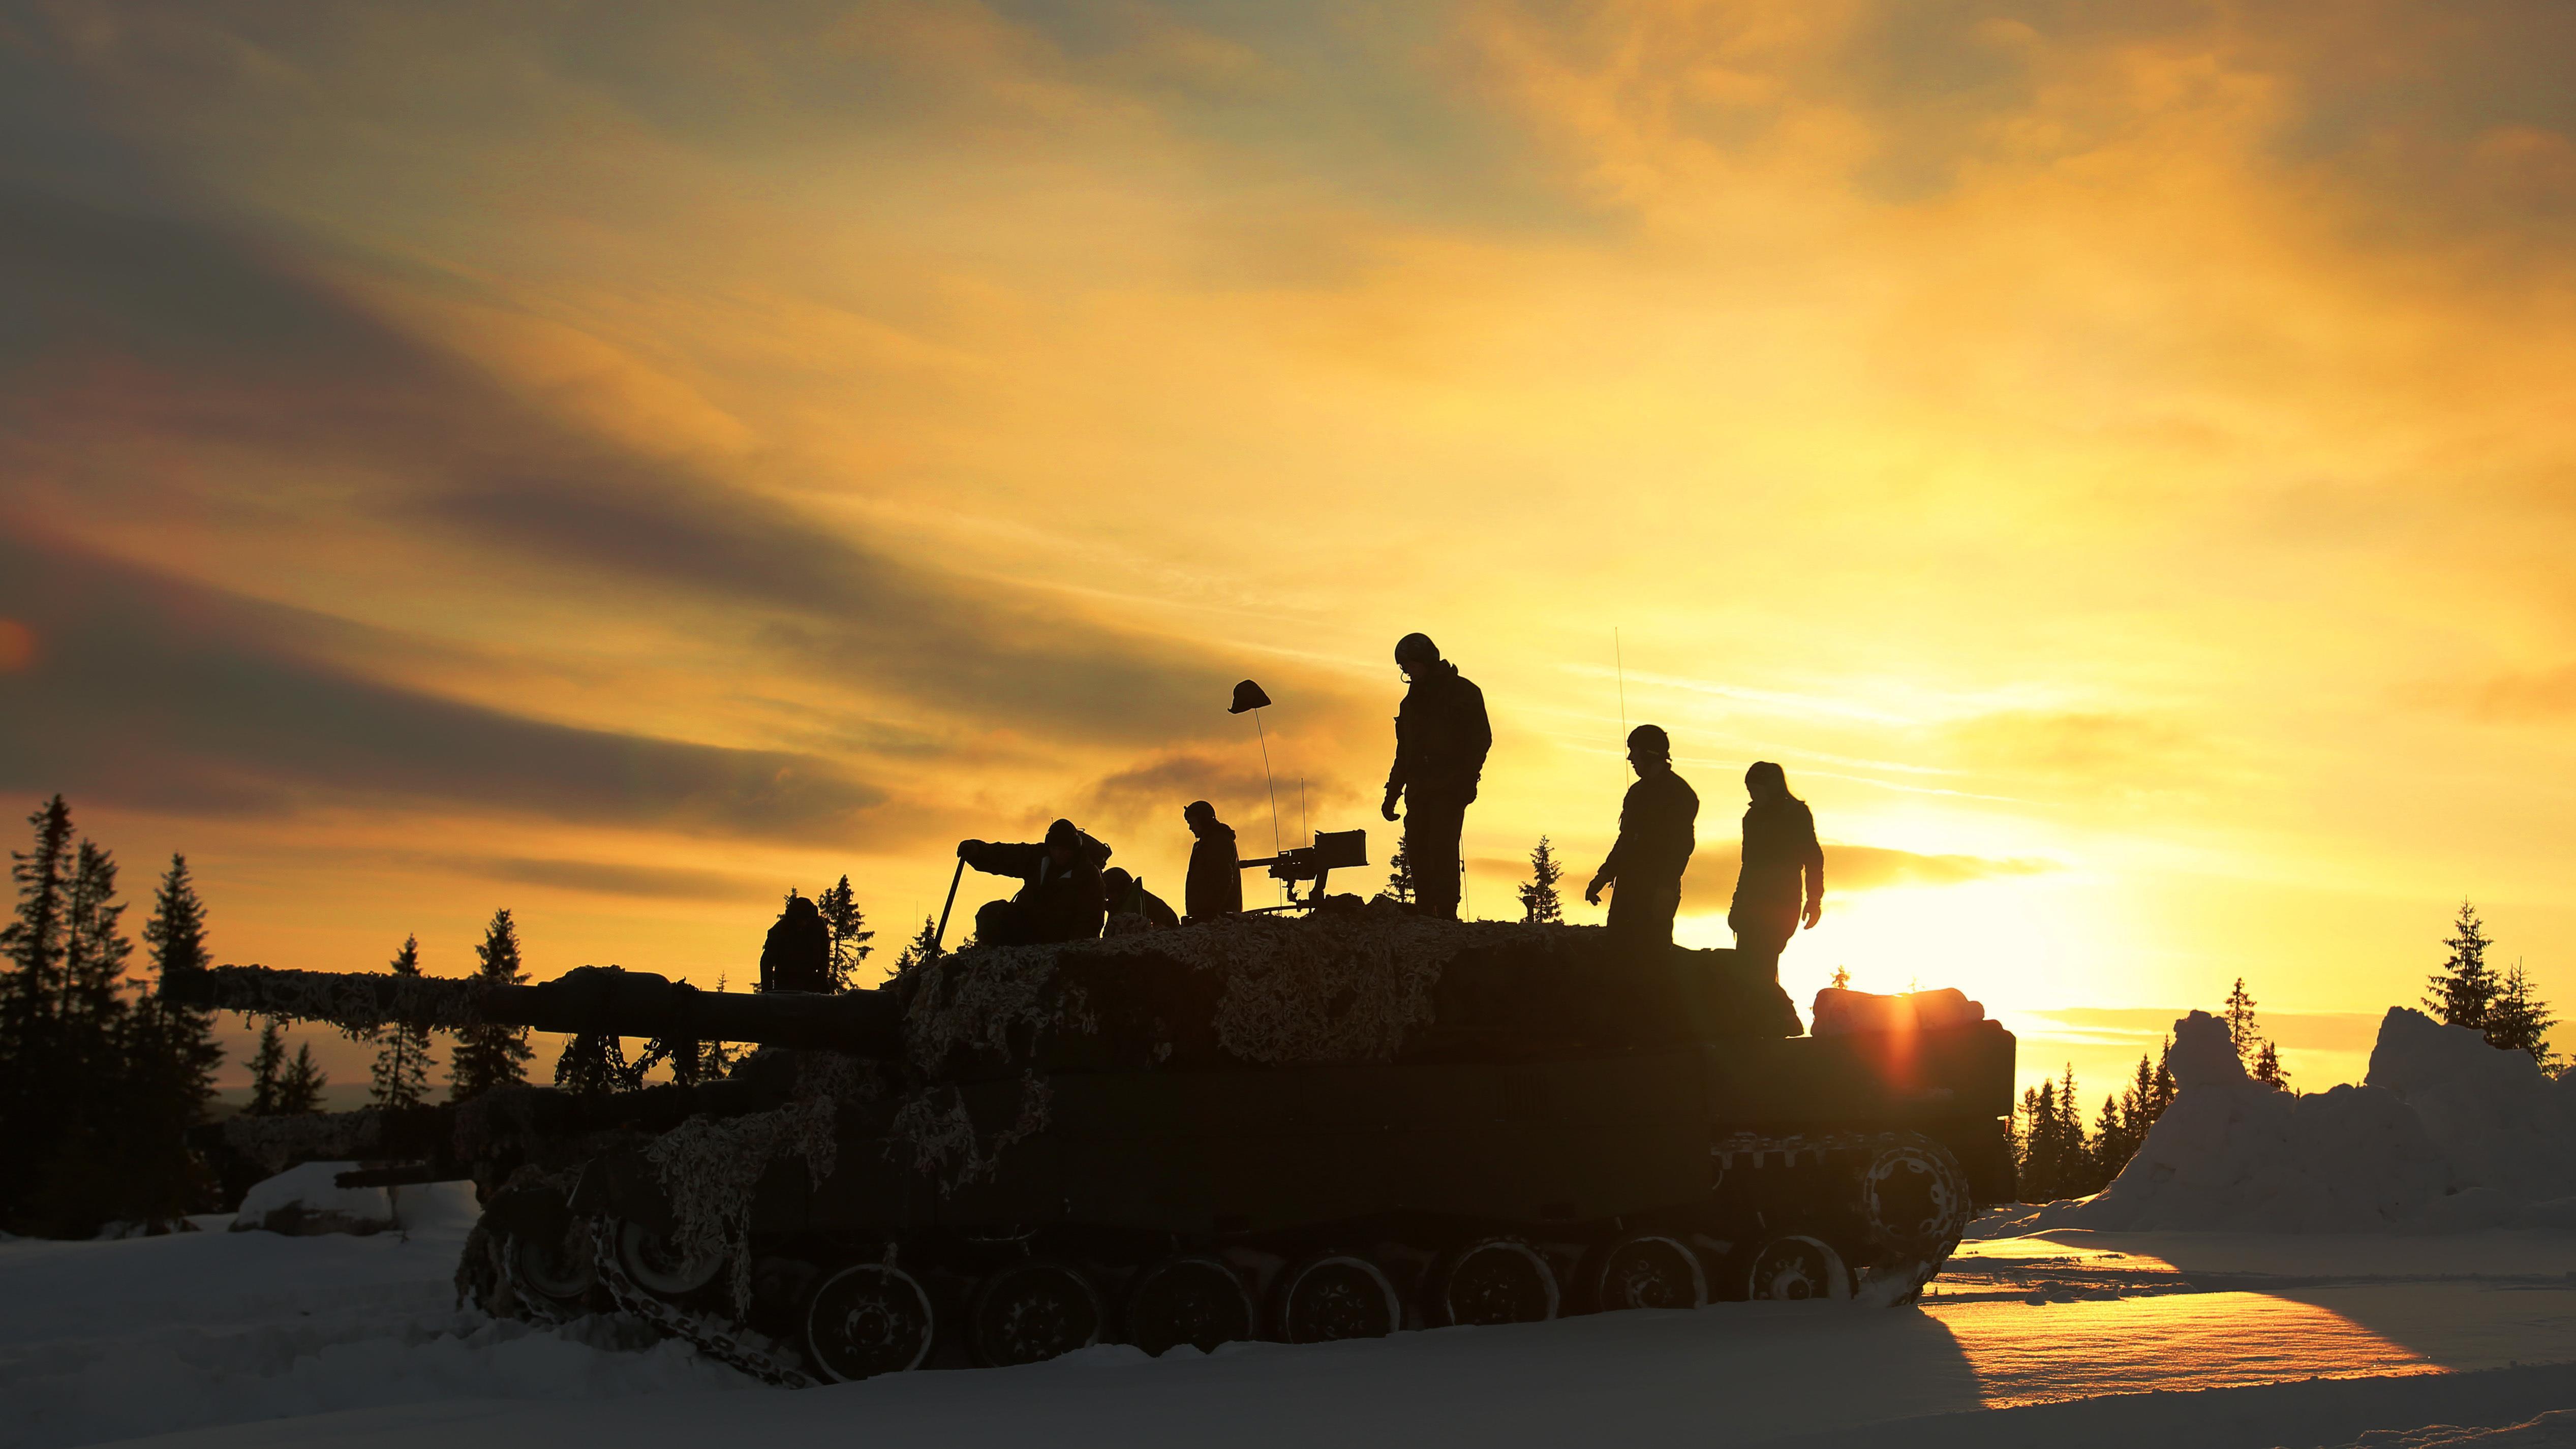 Norway proposes tactics to reinforce border defense